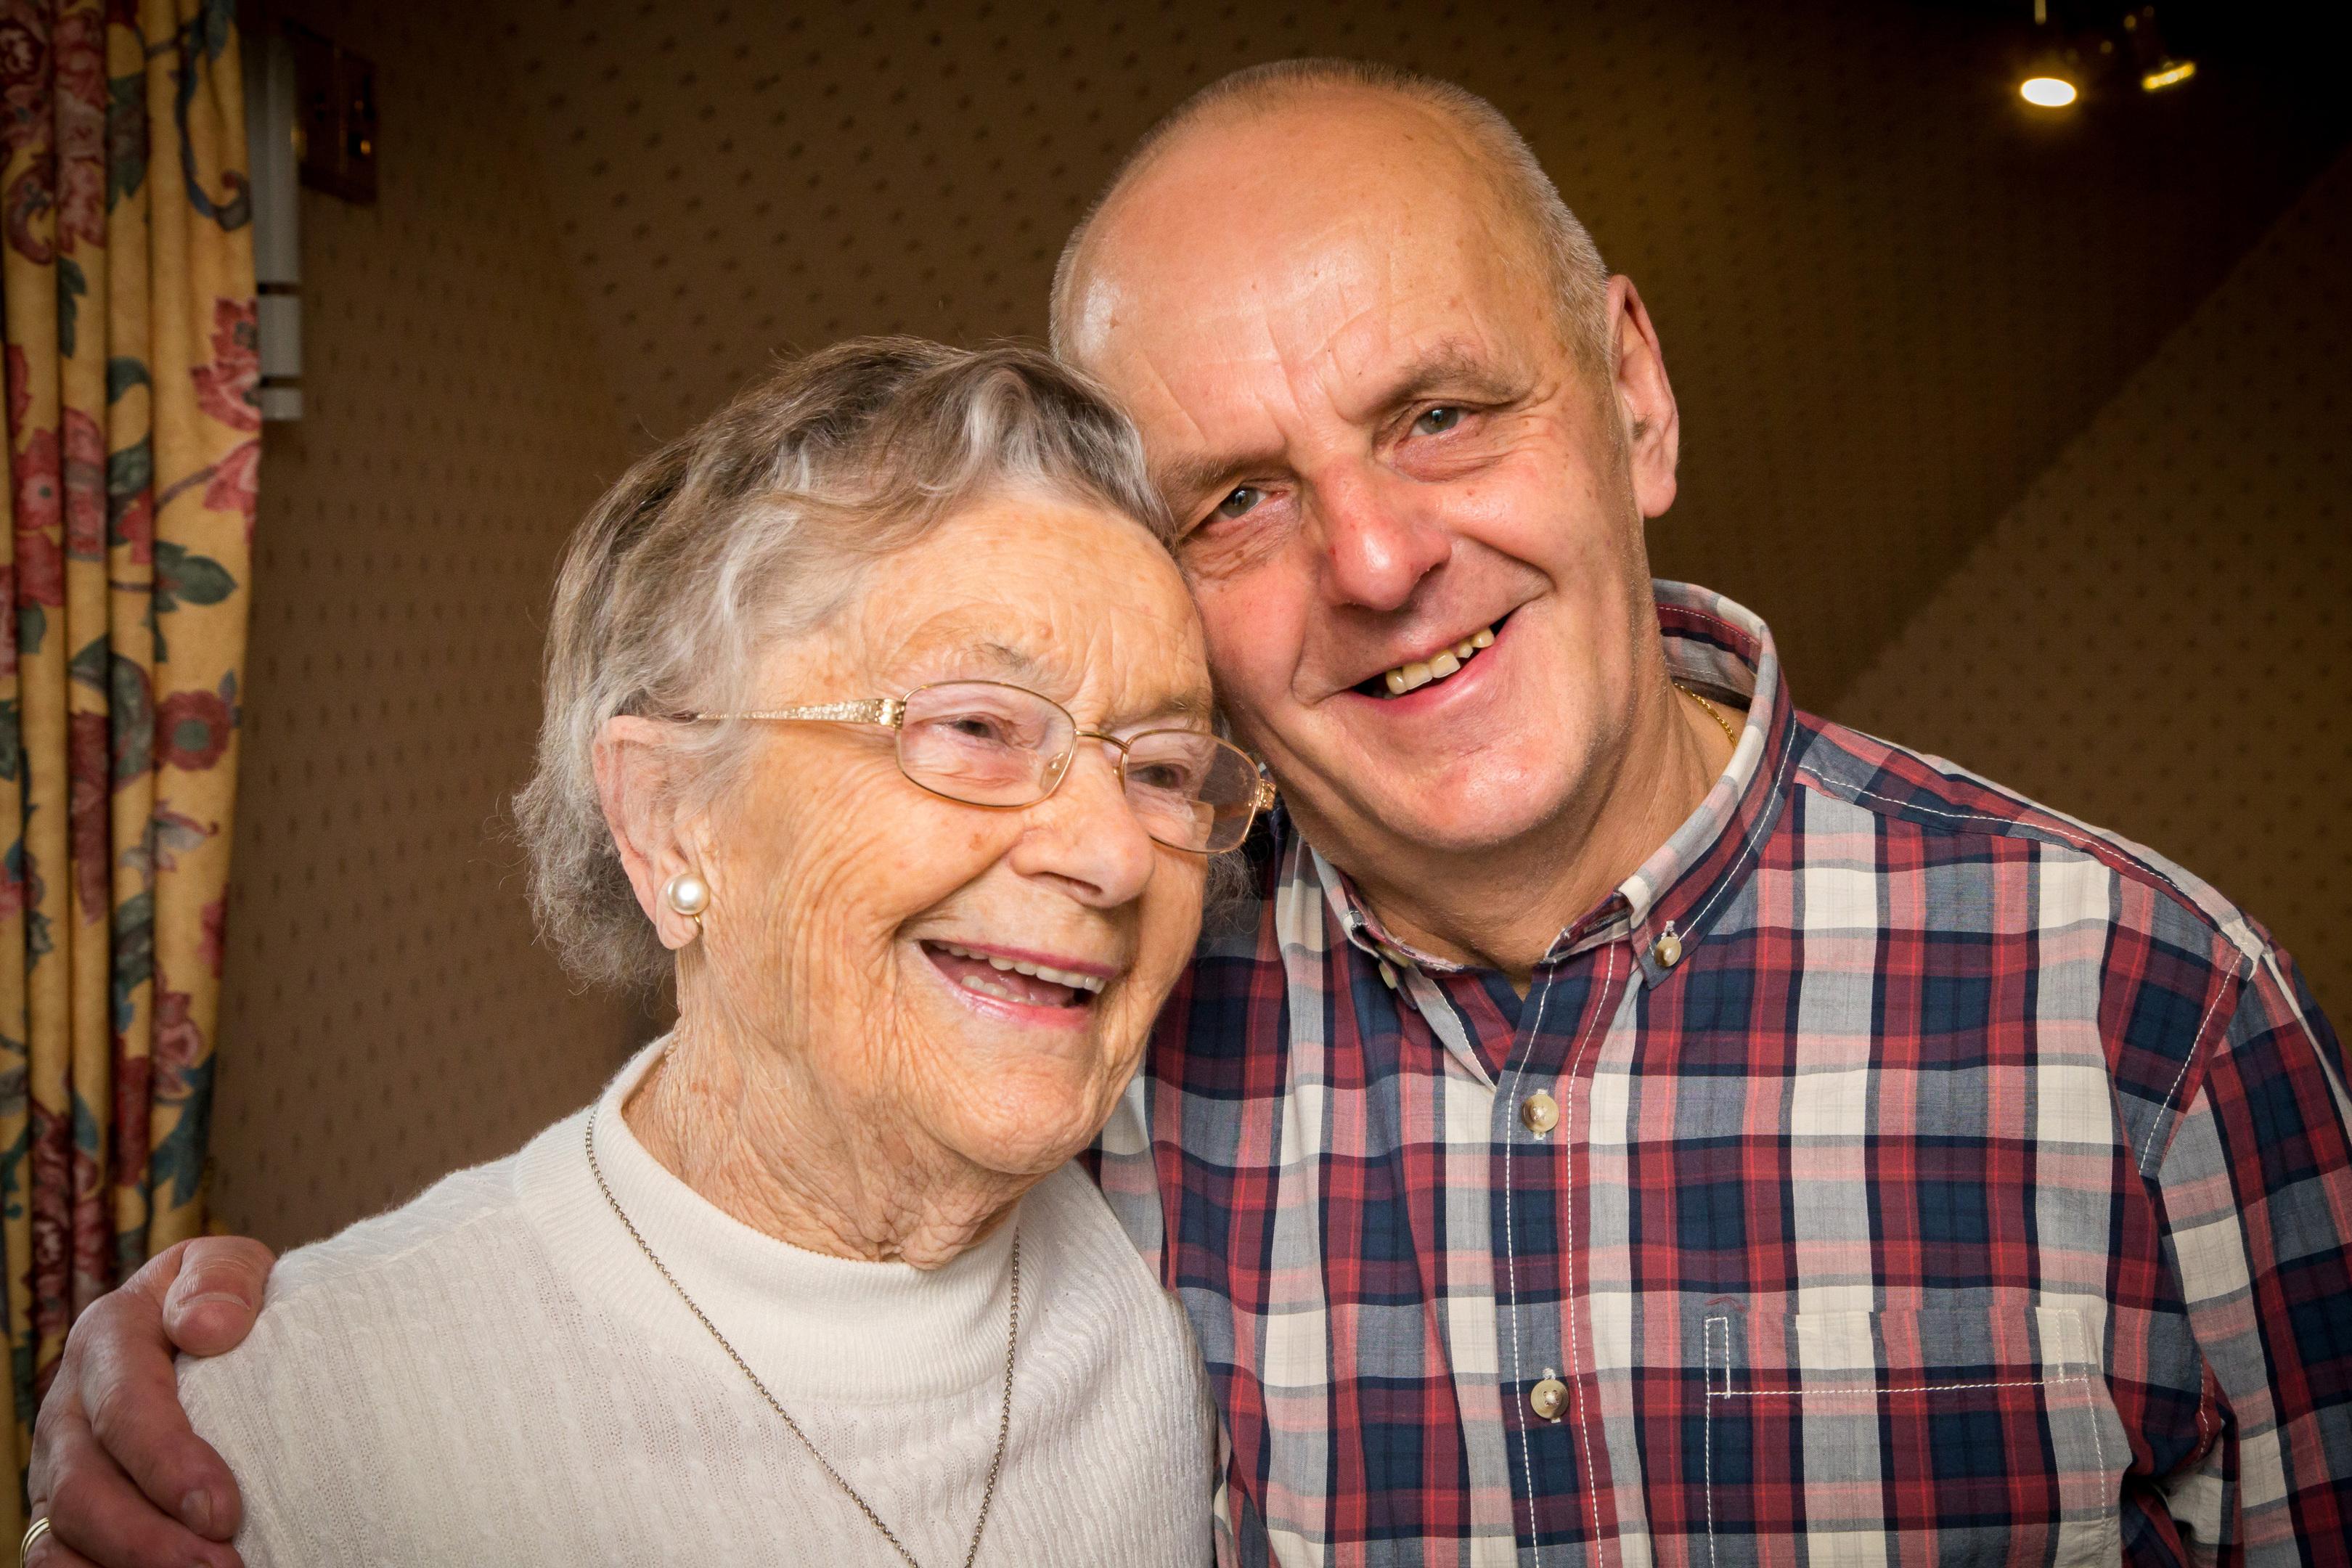 Retired nurse Margaret McInroy with Bill Douglas, who she nursed as a sick baby (Bob Collier Photos)